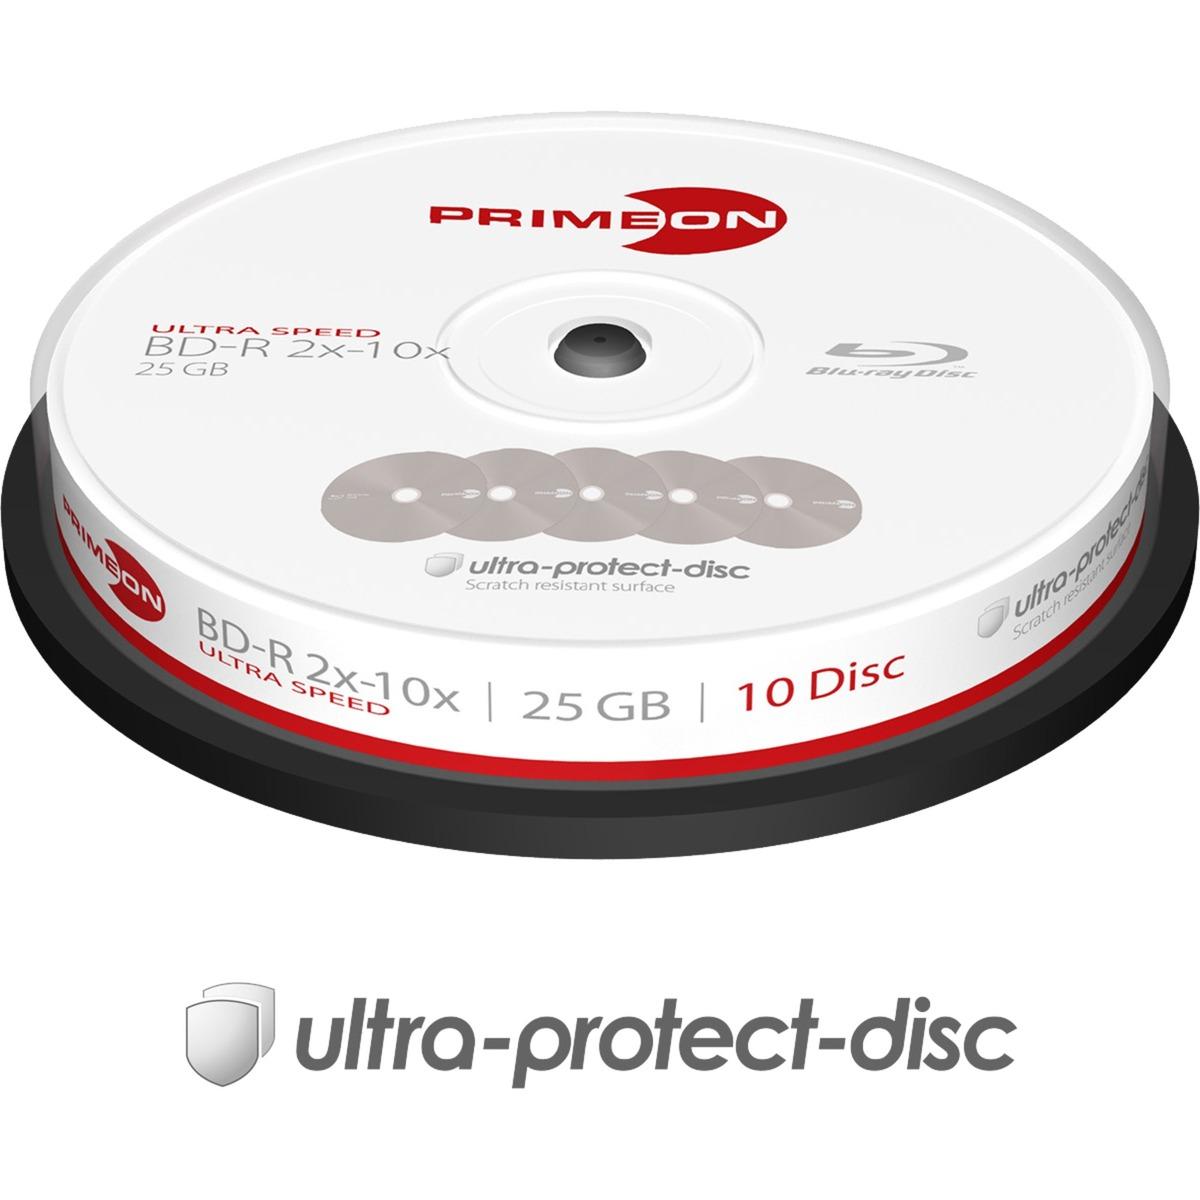 2761307 disco blu-ray lectura/escritura (BD) BD-R 25 GB -, 10, Discos Blu-ray vírgenes